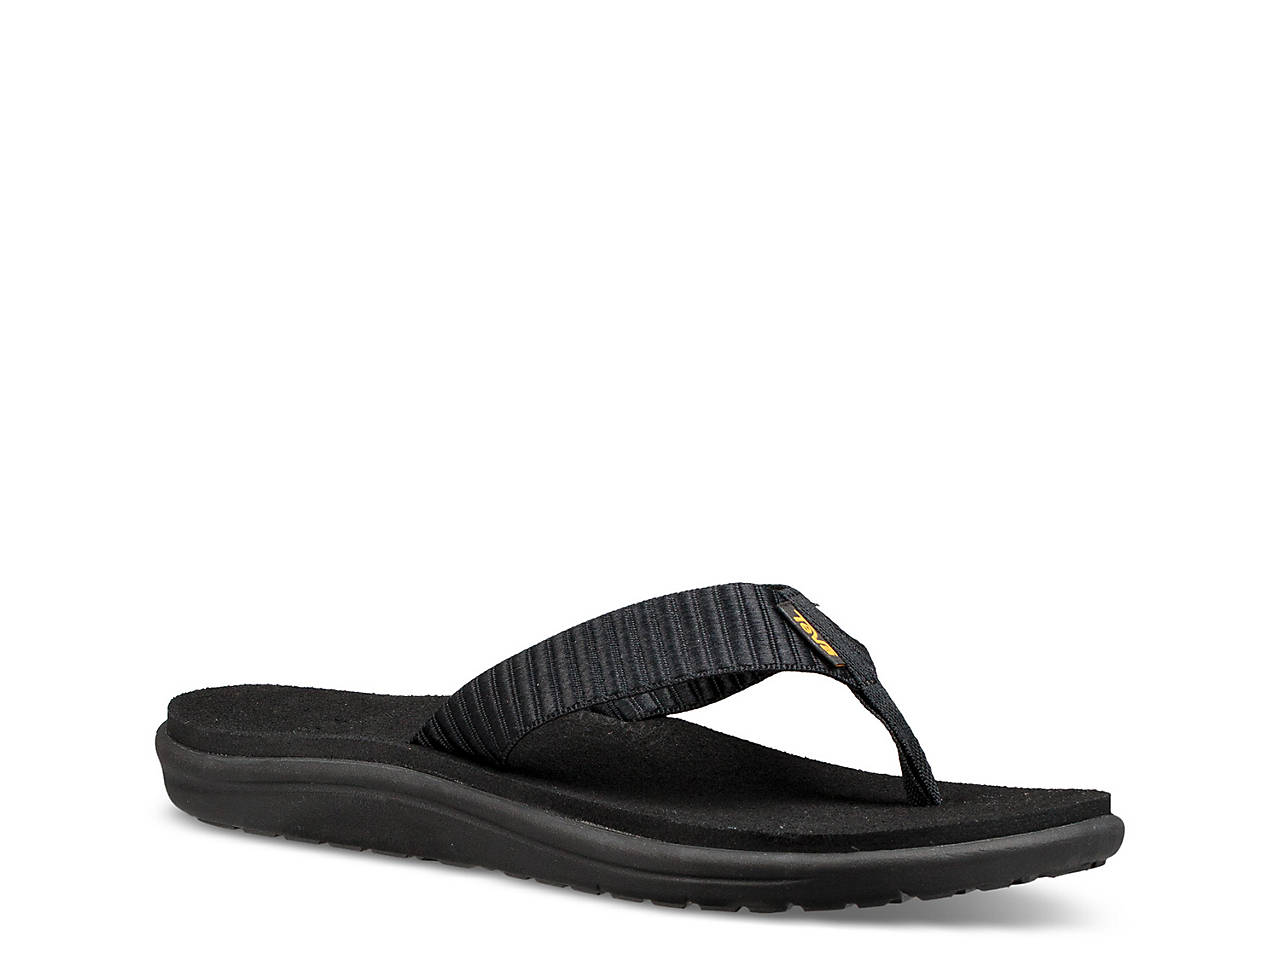 deb0f4c57 Teva Voya Flip Flop Women s Shoes